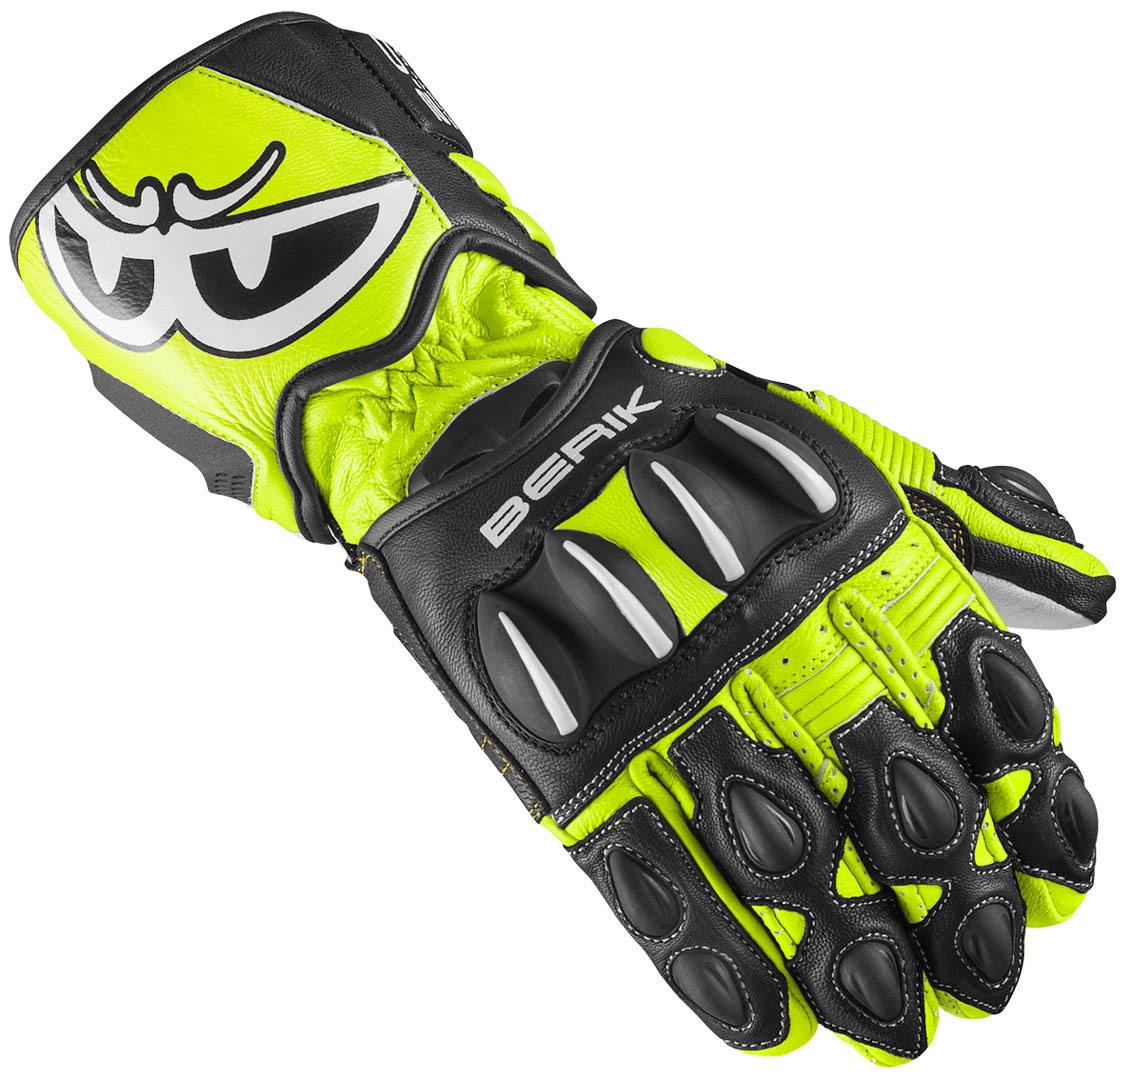 Berik Thunar Evo Motorradhandschuhe, schwarz-gelb, Größe S, schwarz-gelb, Größe S